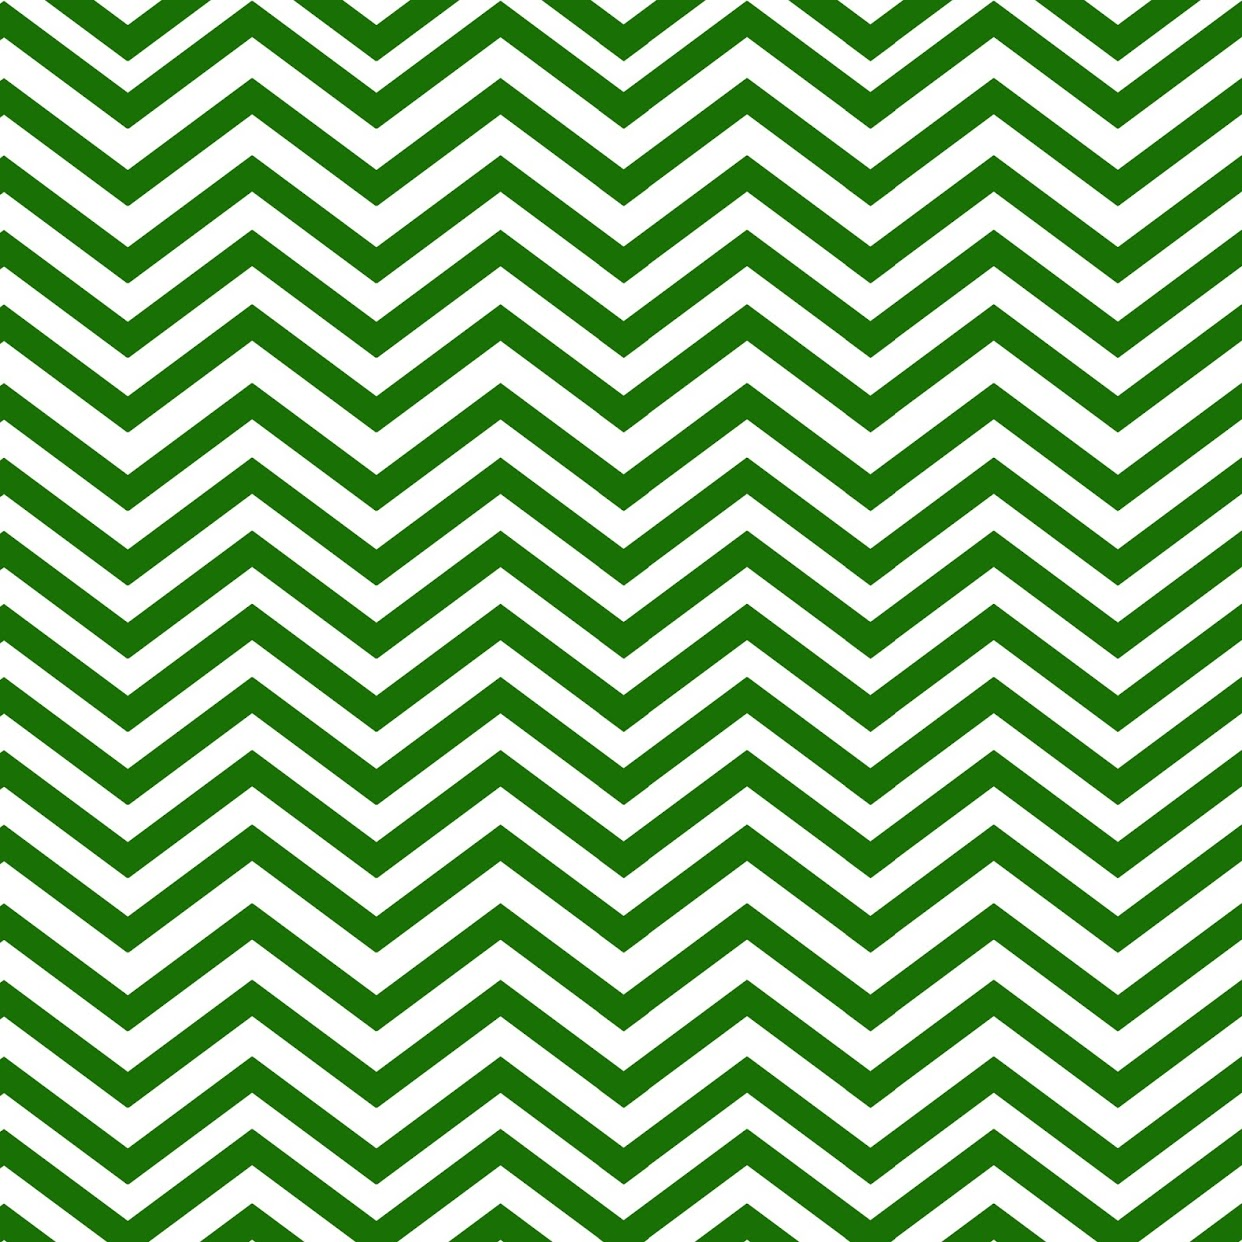 [50+] Mint Green Chevron Wallpaper on WallpaperSafari